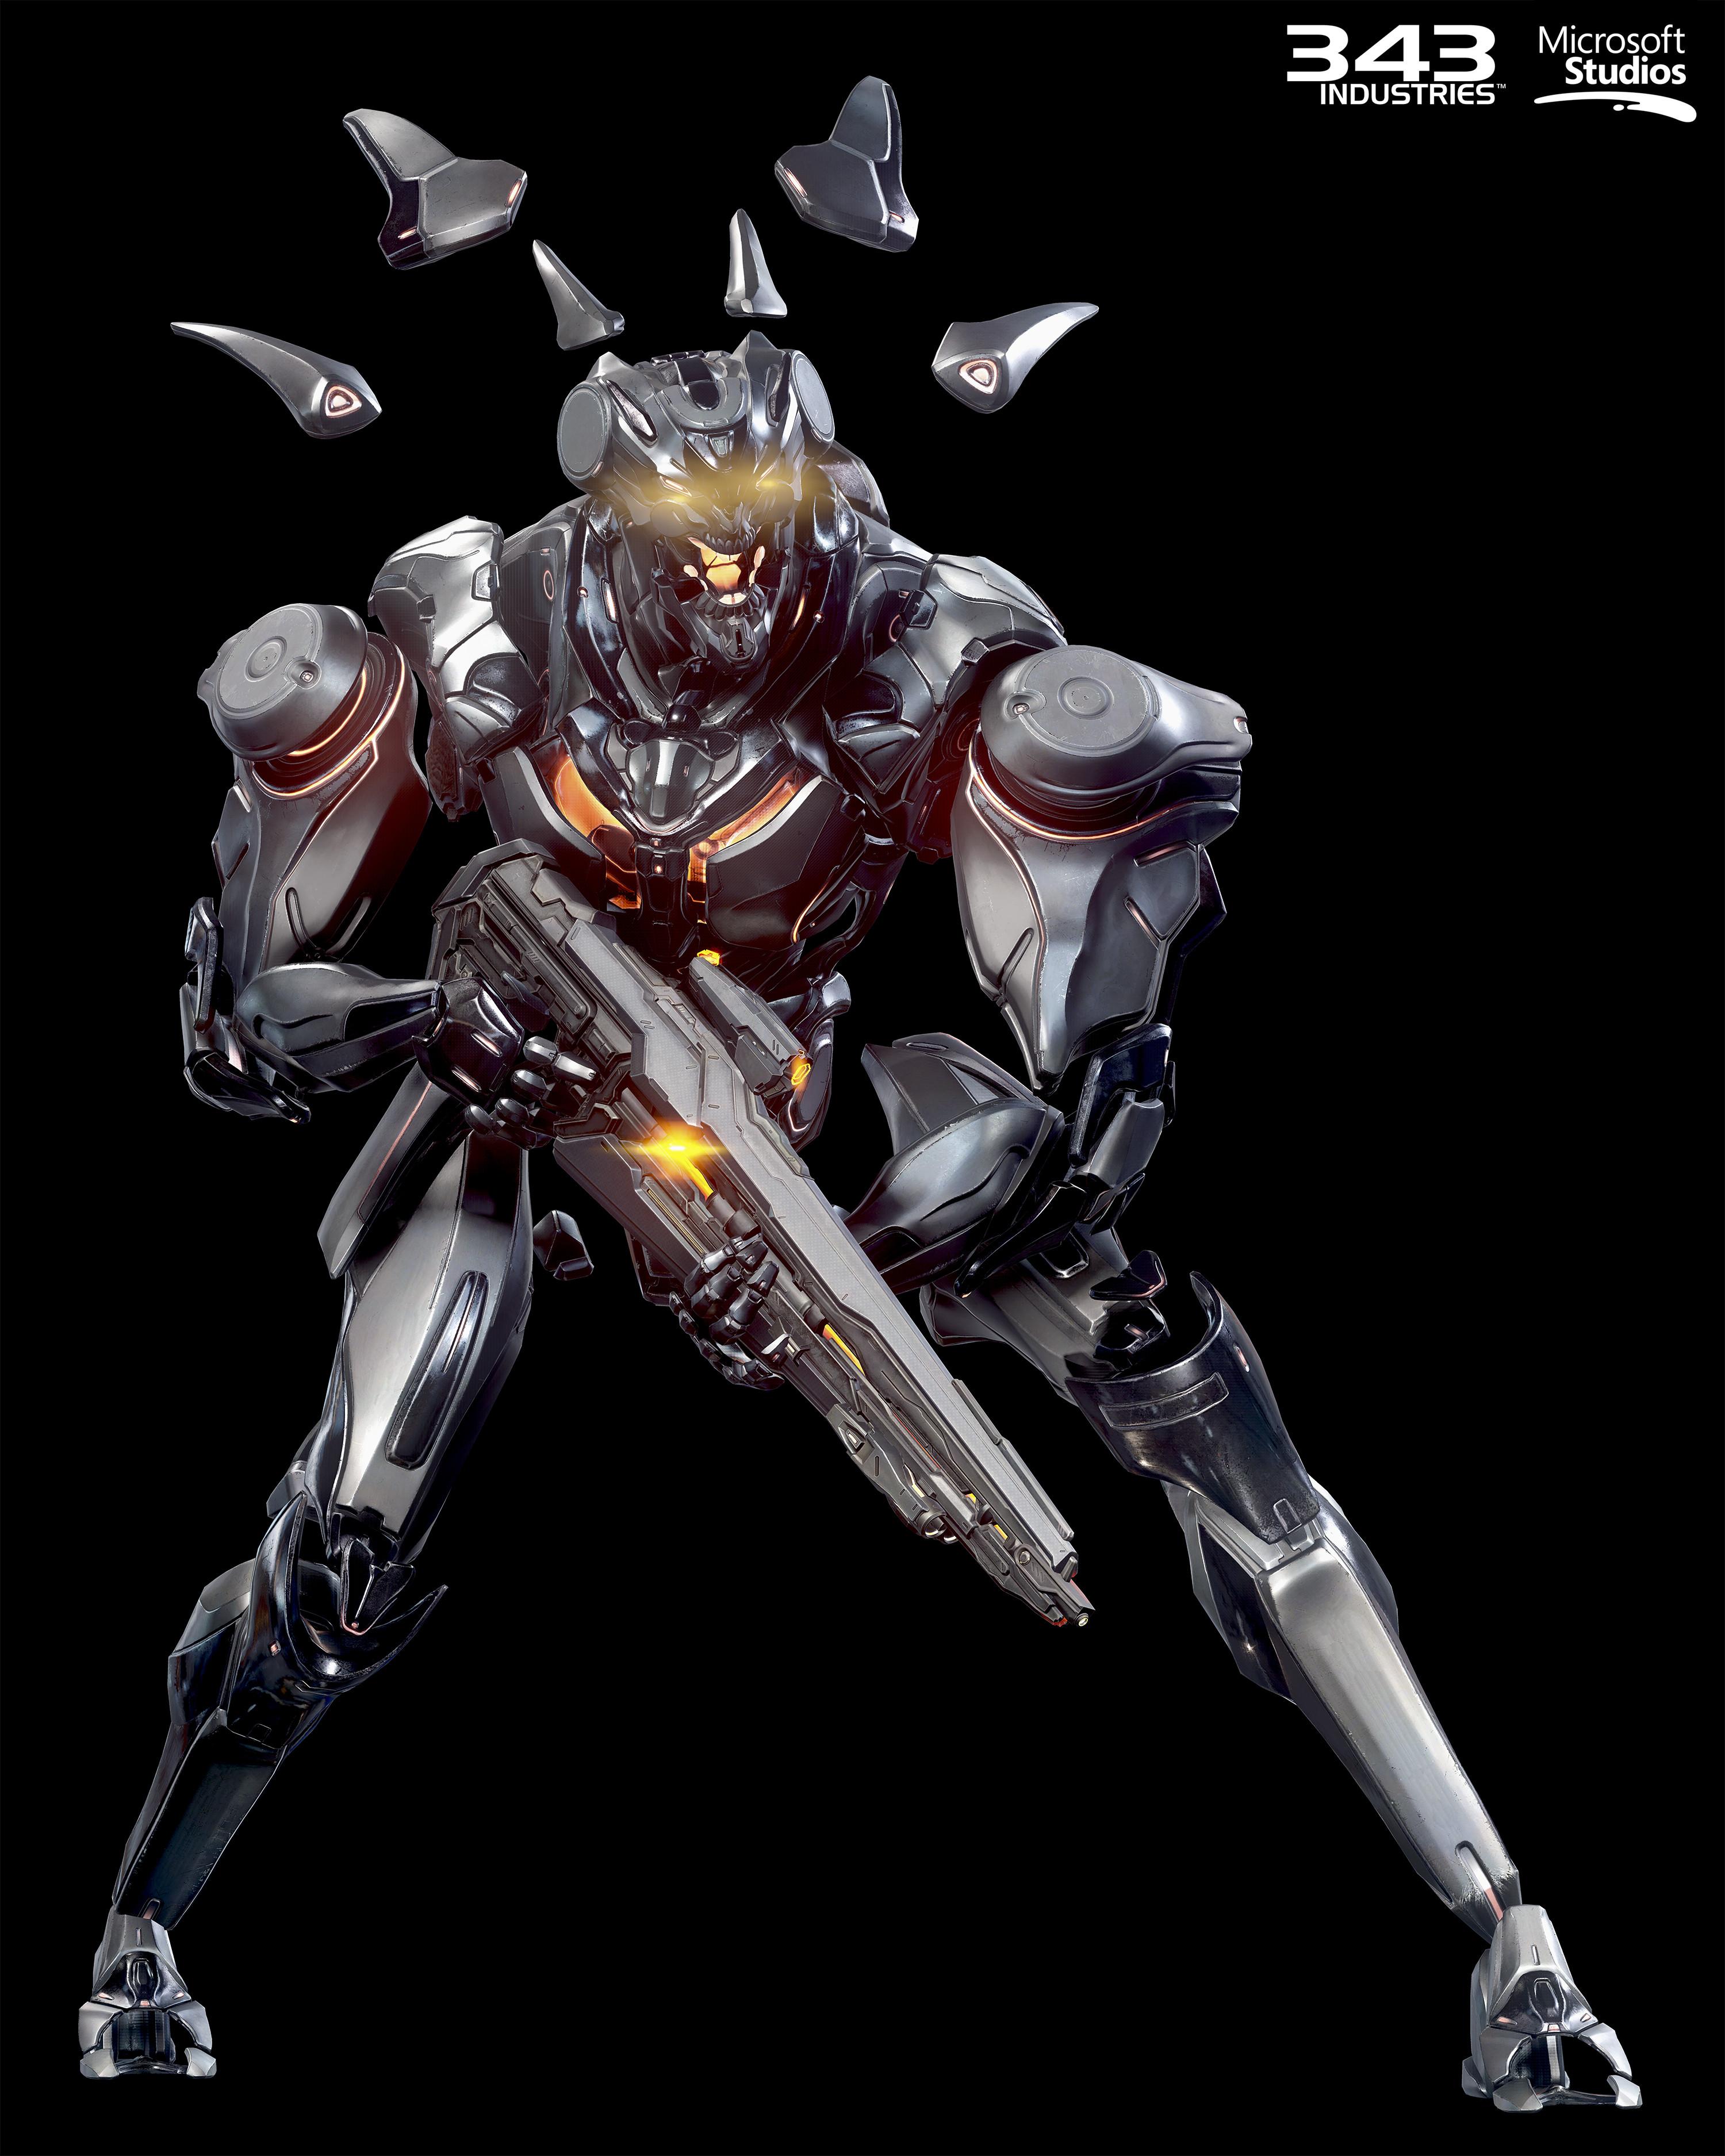 In-engine render by Matt Aldridge. Weapon by Can Tuncer.